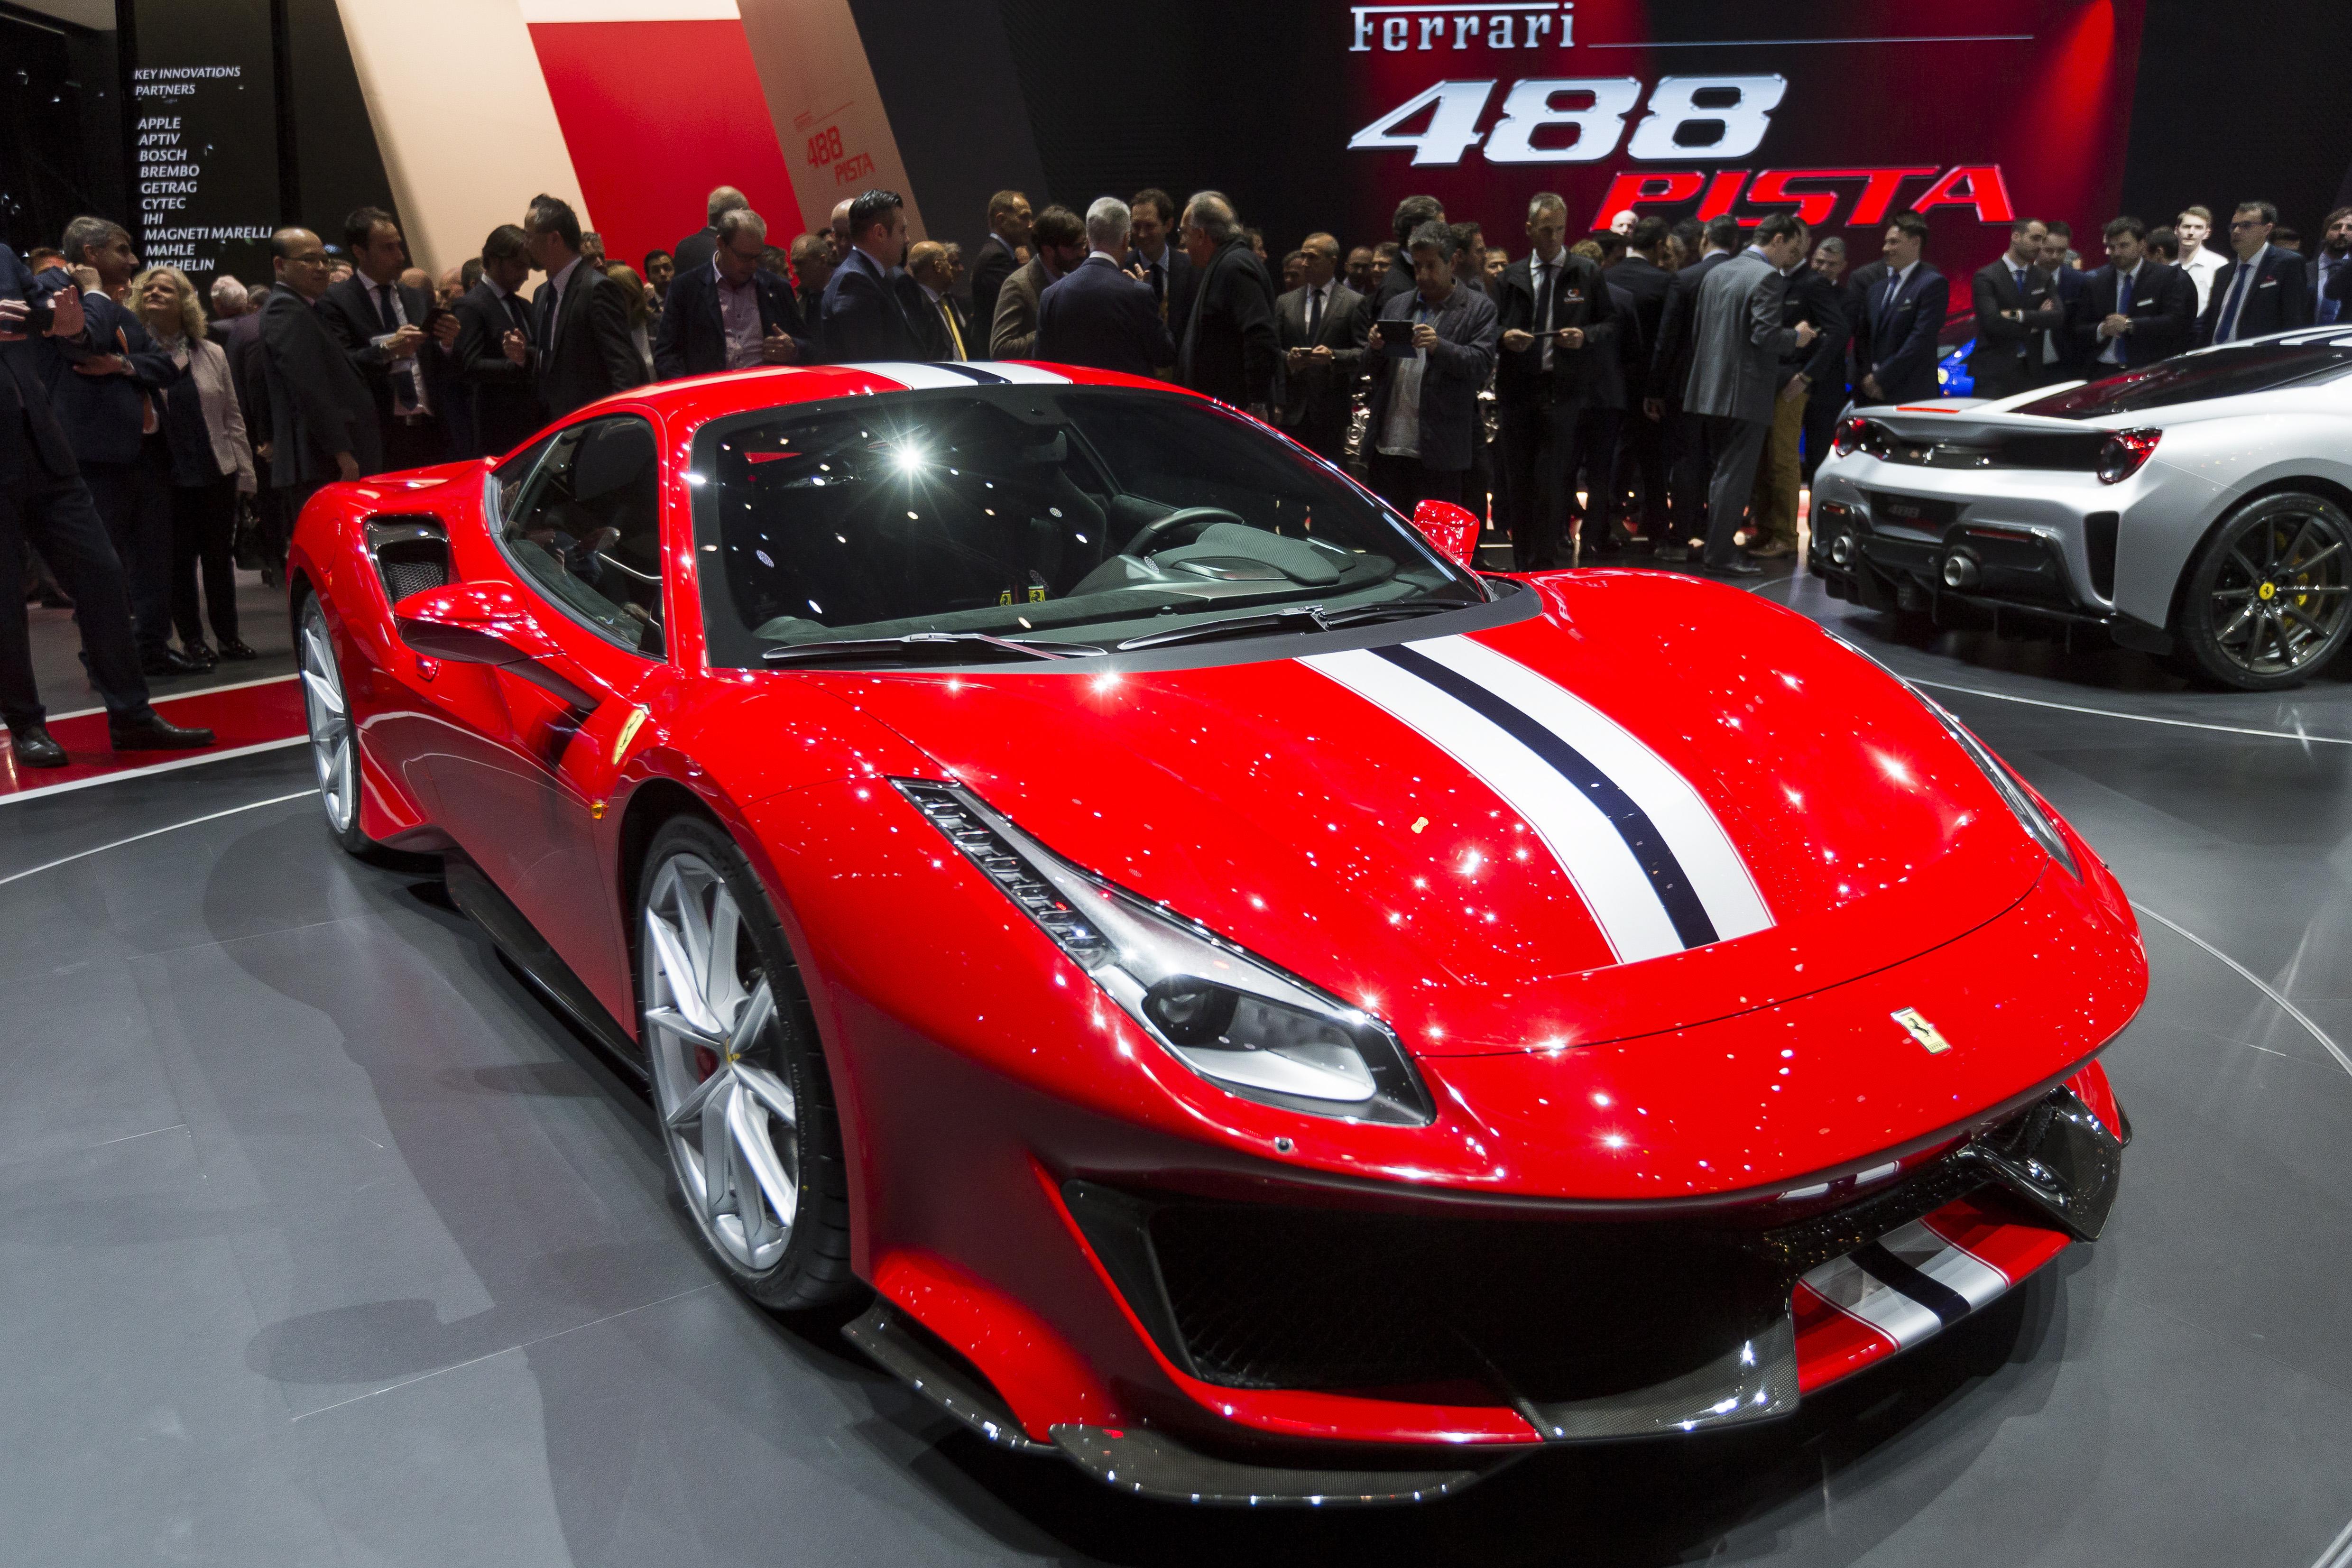 Electric cars: Ferrari is testing a hybrid supercar — Quartz